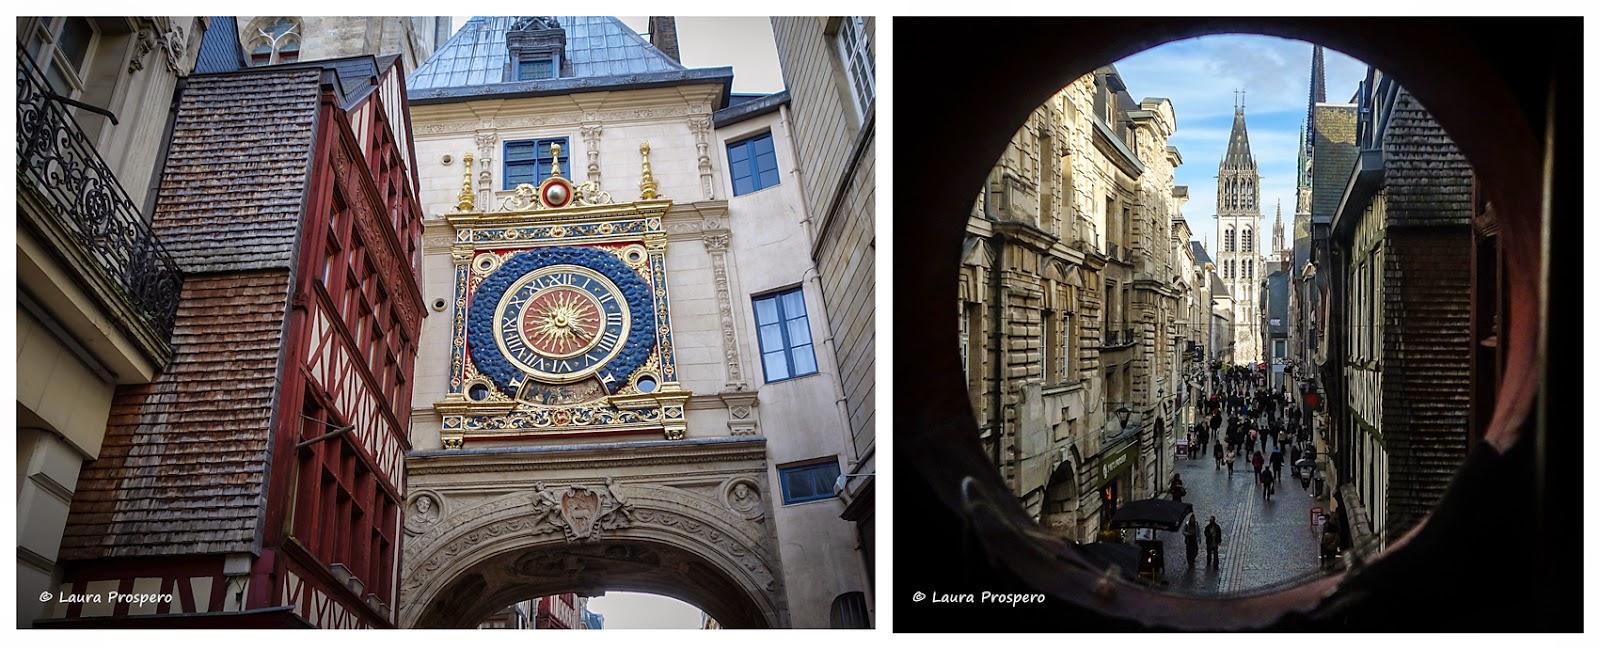 Gros Horloge - Rouen © Laura Prospero